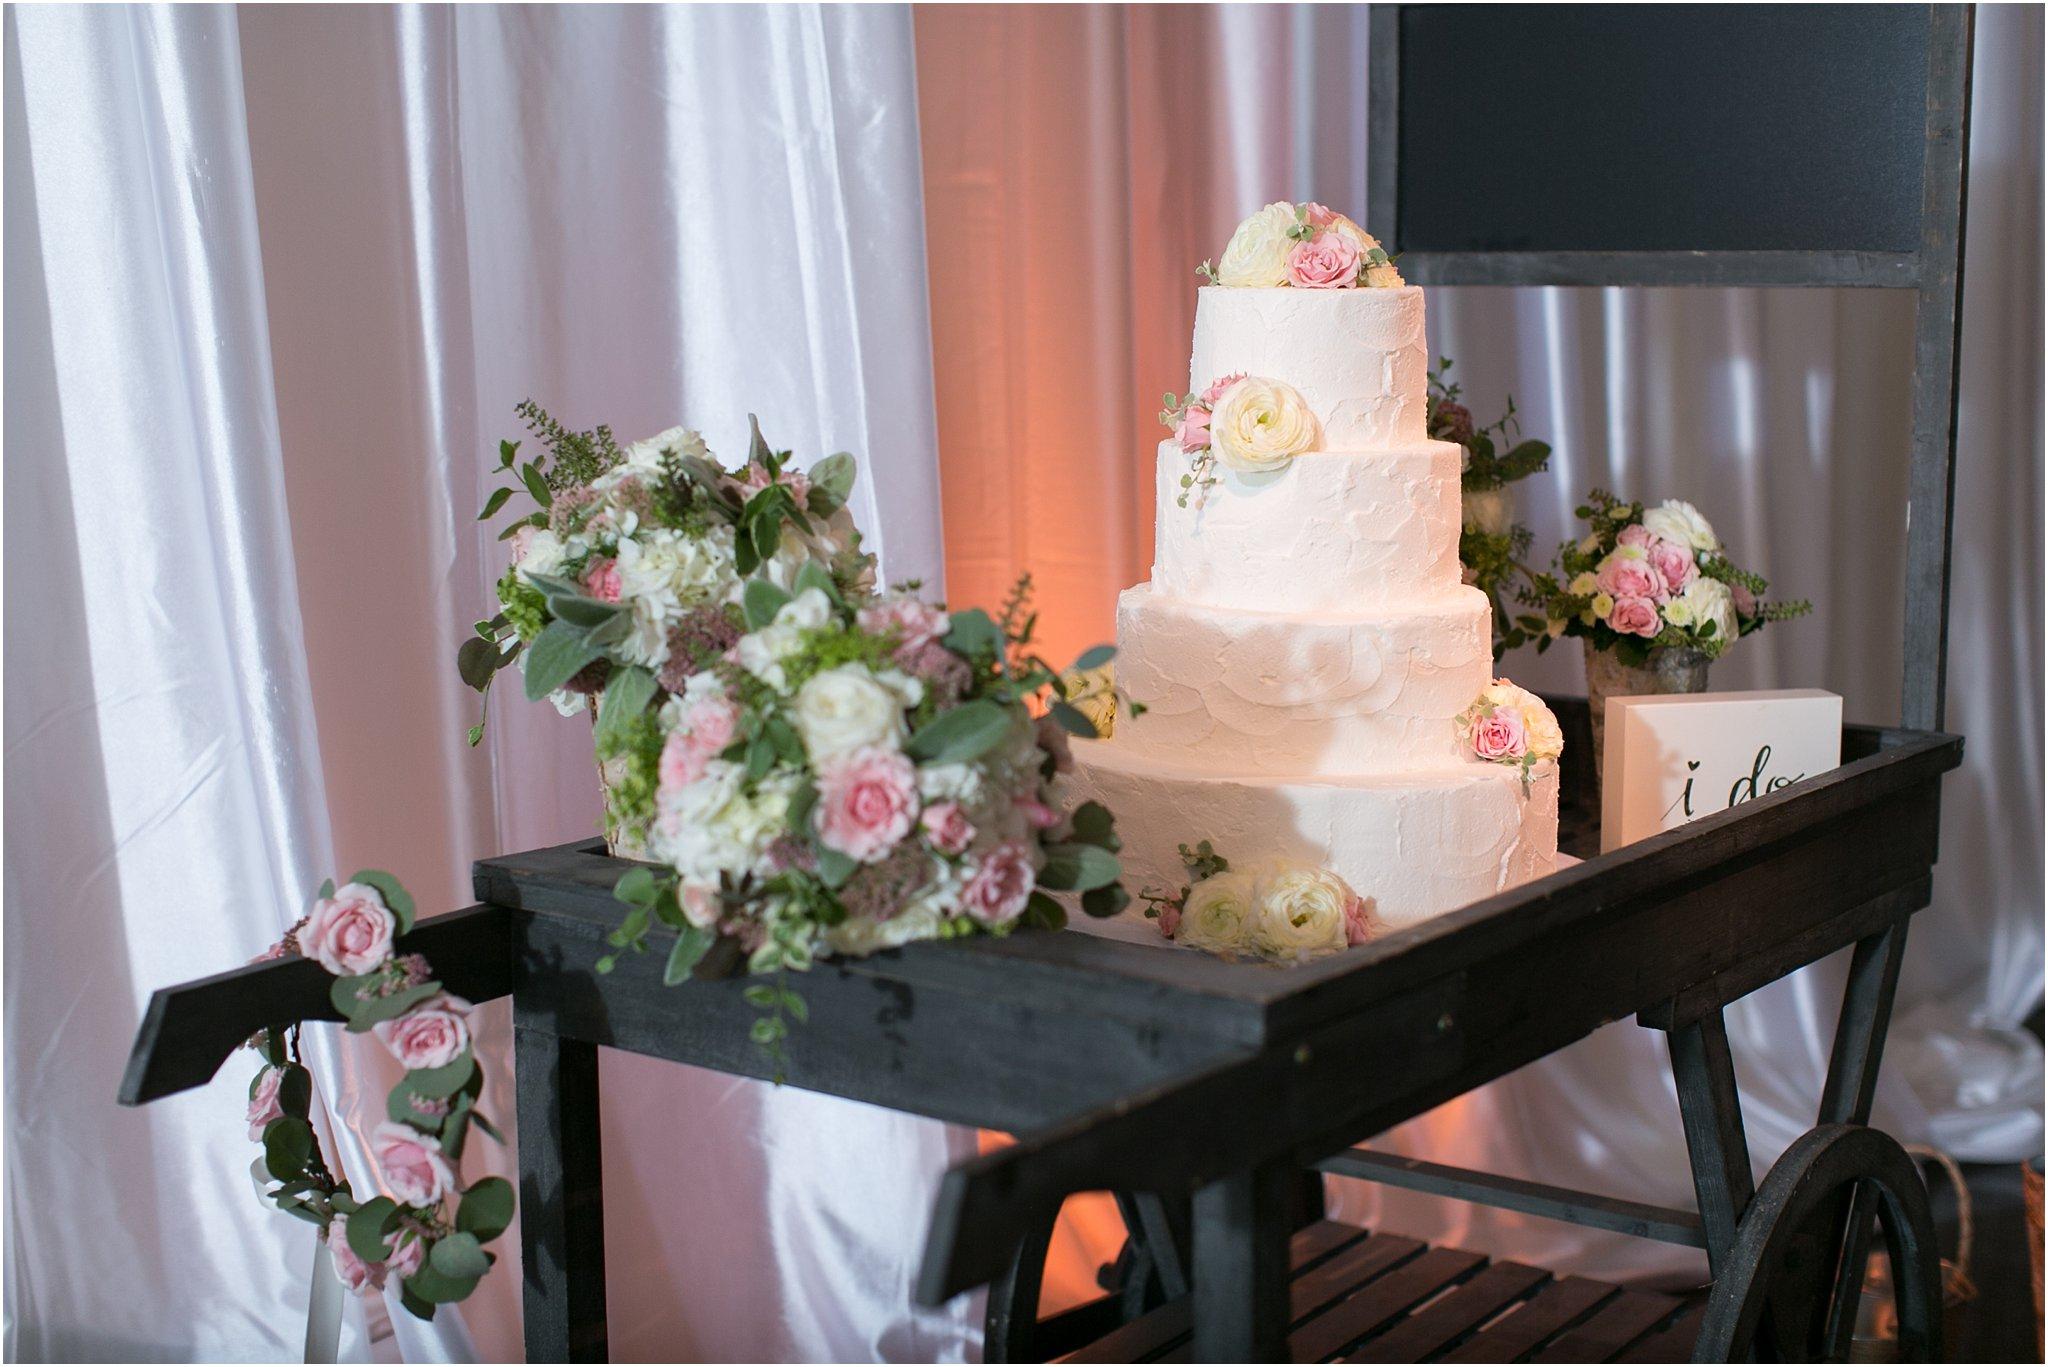 jessica_ryan_photography_virginia_wedding_photographer_wedding_hurricane_norfolk_botanical_gardens_hurricane_matthew_wedding_3610